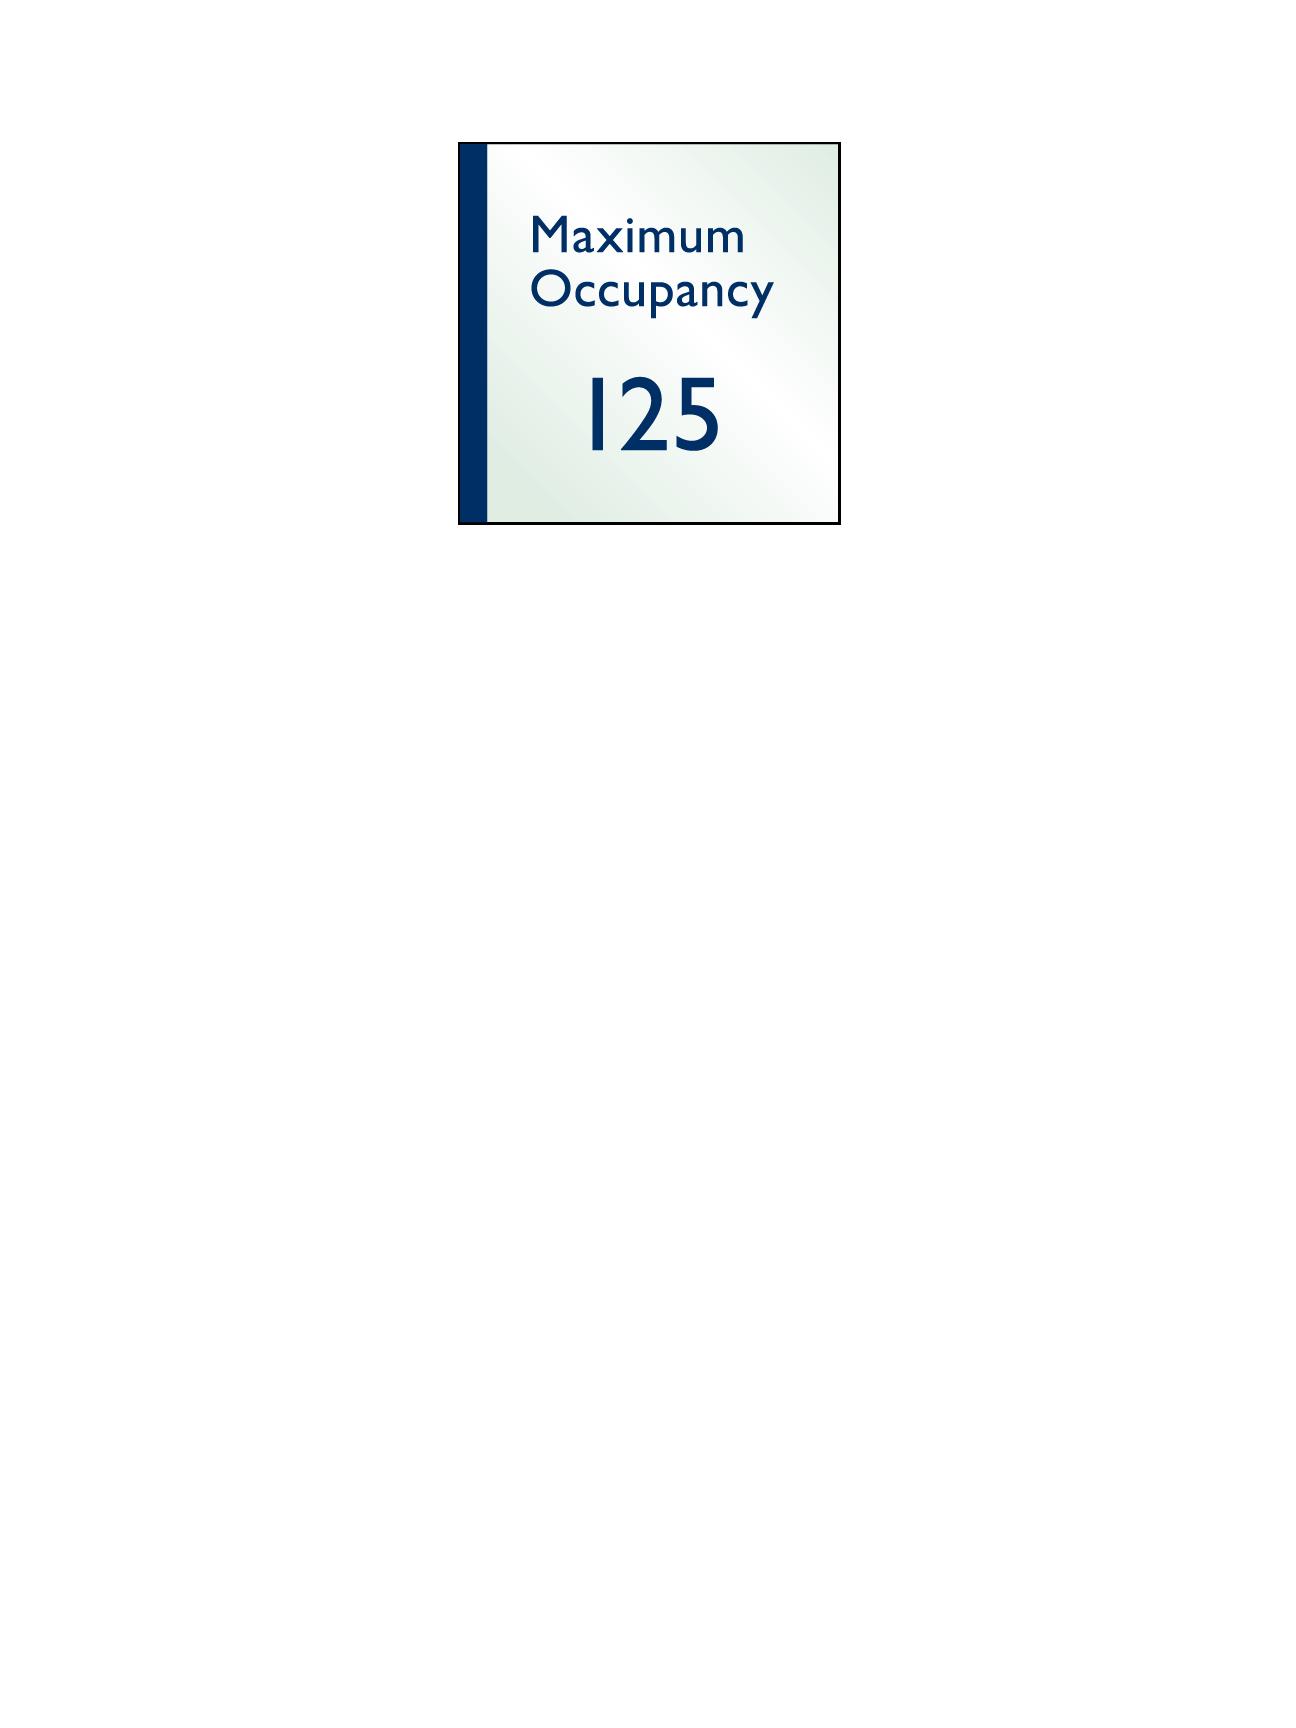 Sign:Regulatory, Max Occupancy